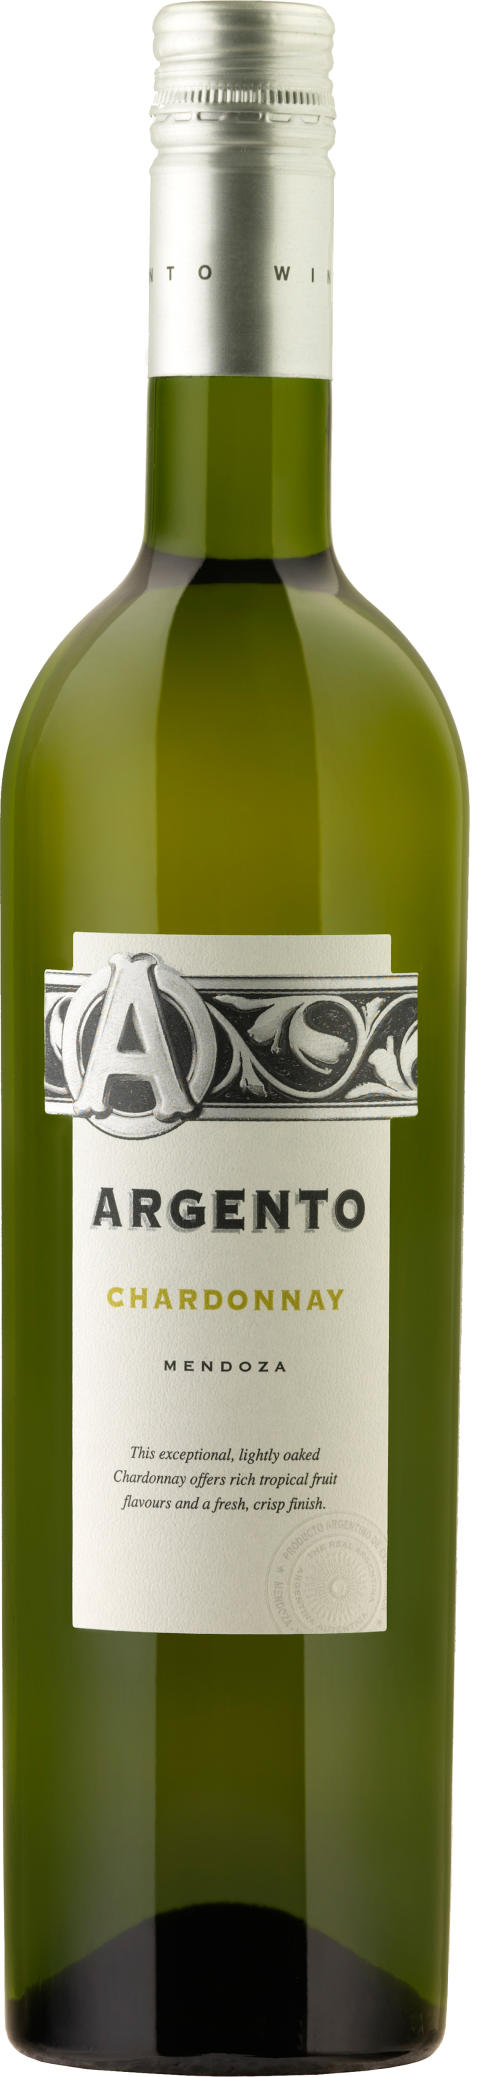 Argento Chardonnay 750ml 6679